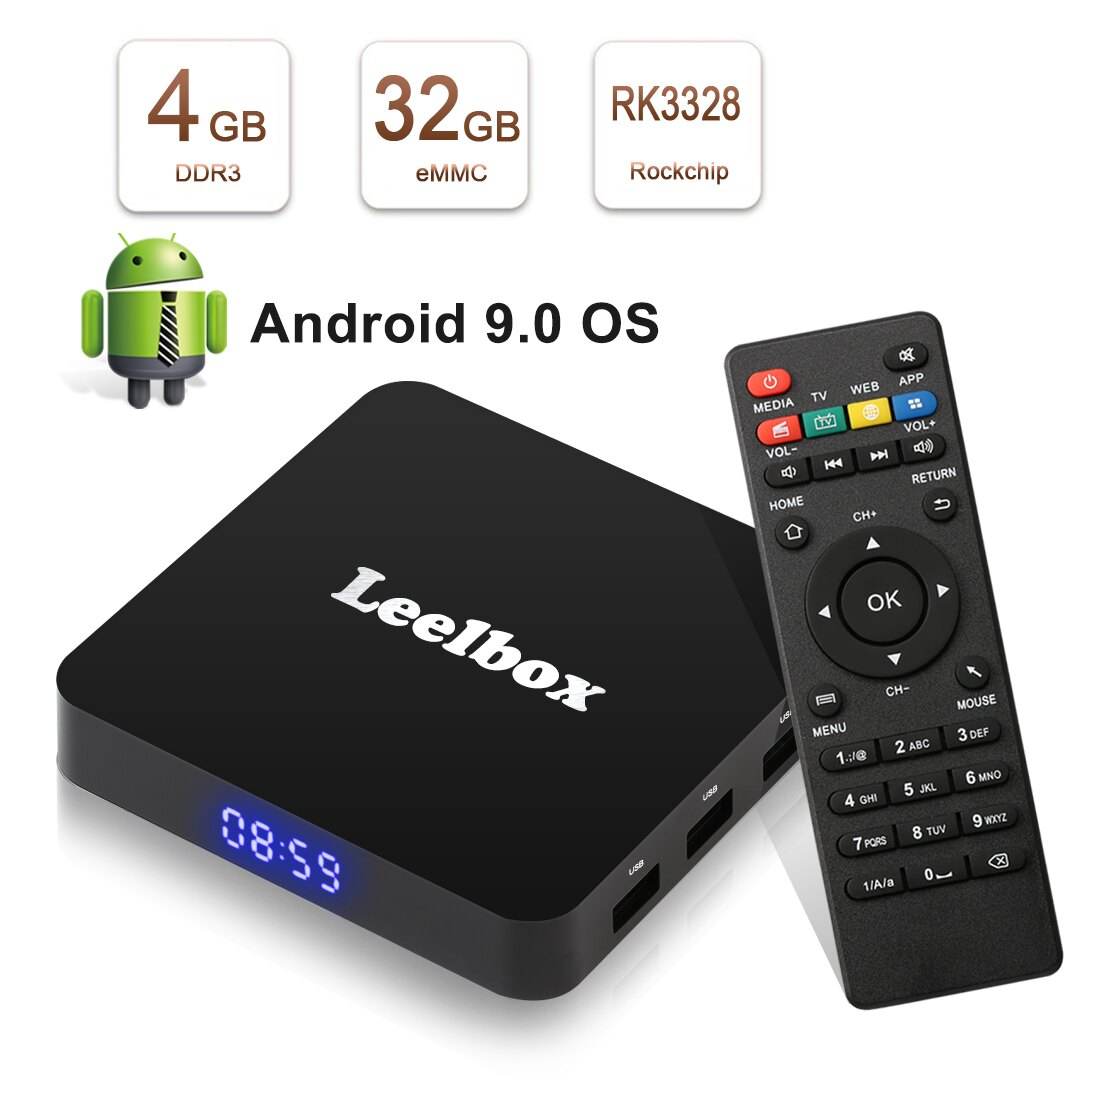 Leelbox Q4 Android 9 0 TV Box 4G+32GB Android TV Box RK3328 Quad Core Media  Player